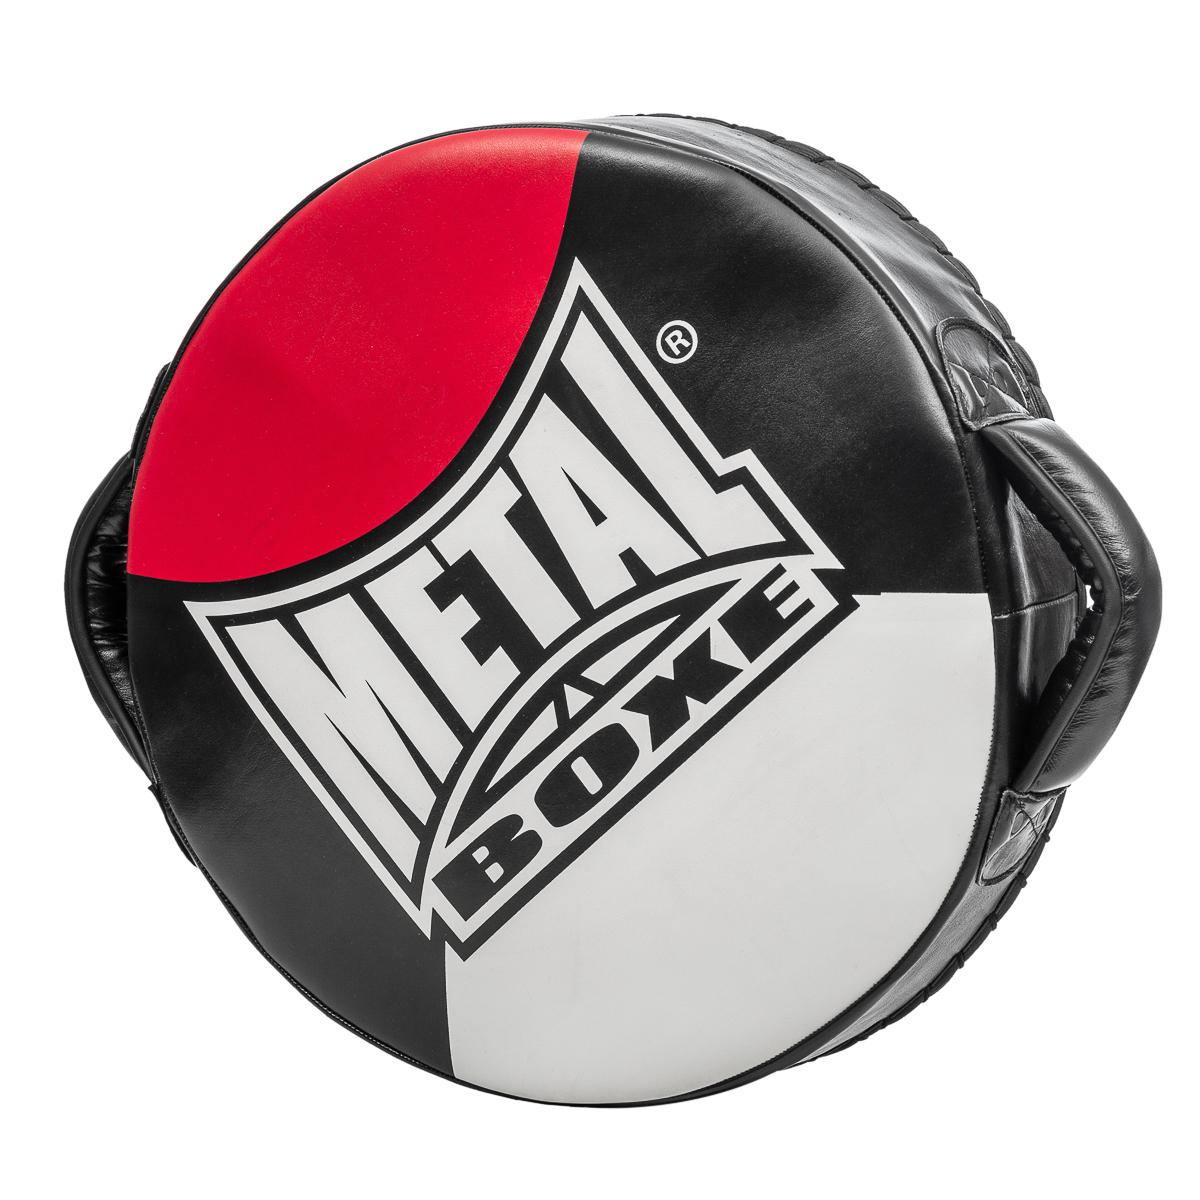 Round punch Métal boxe